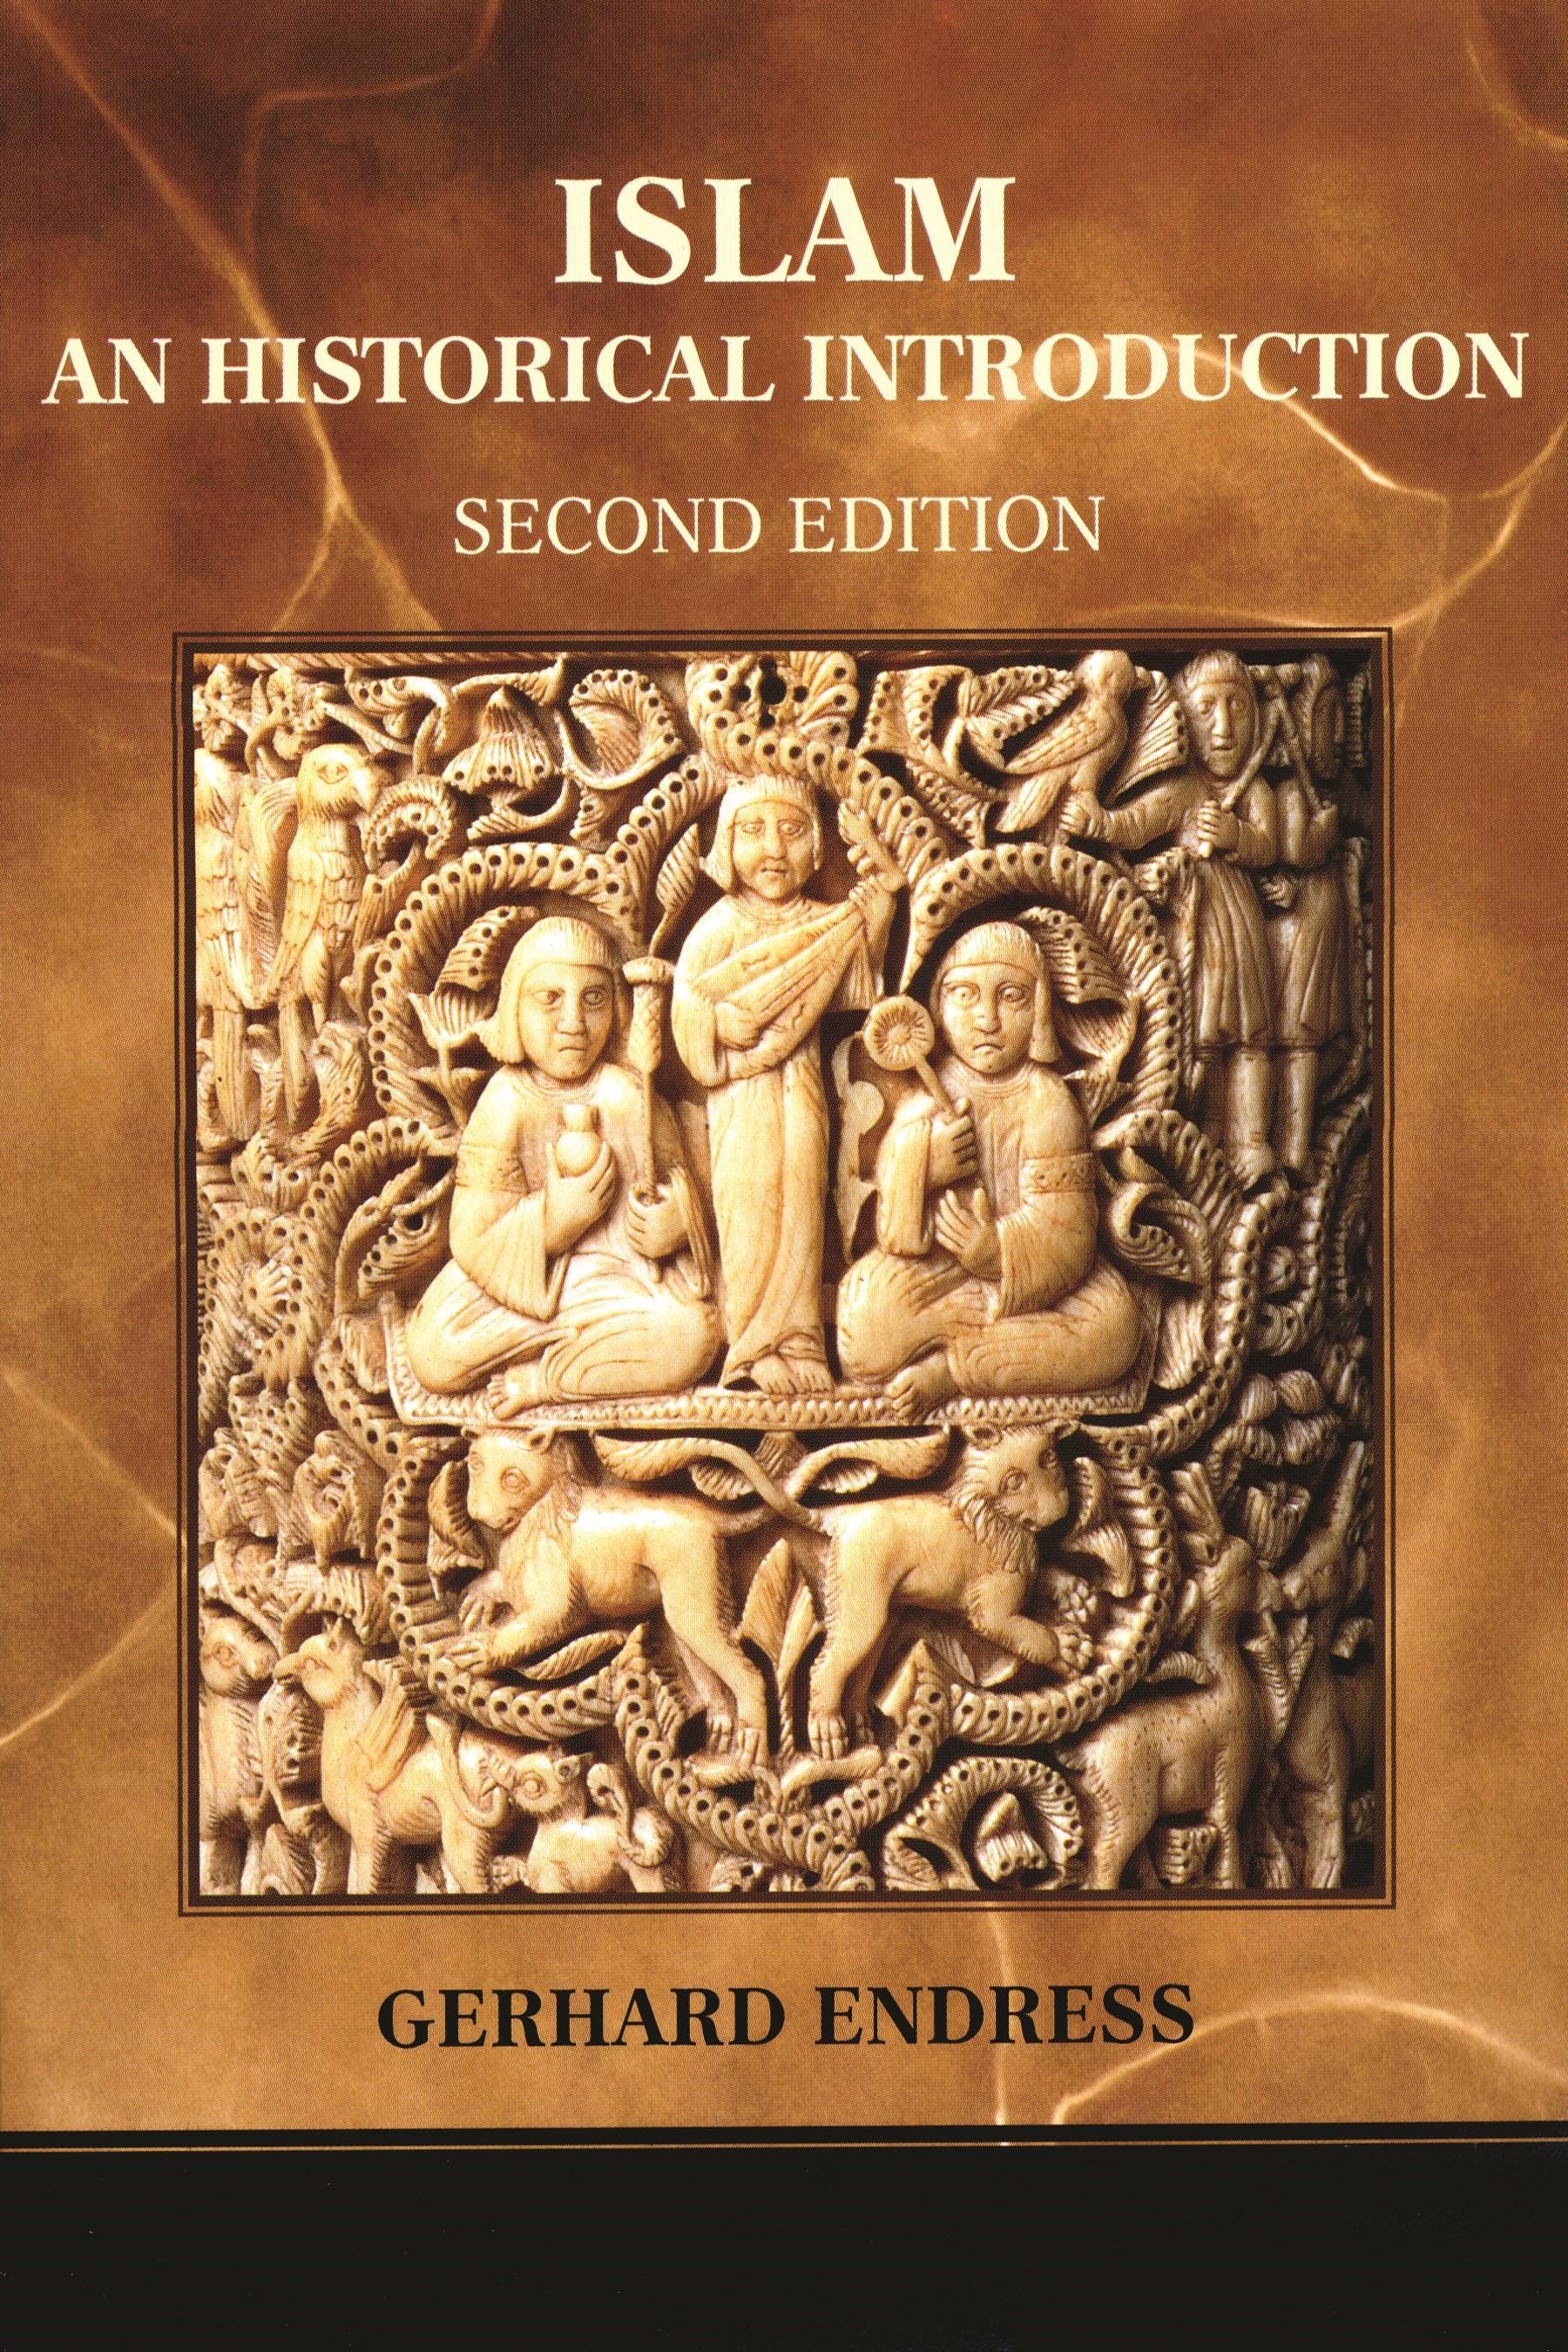 Abbildung von Endress | Islam | second edition | 2003